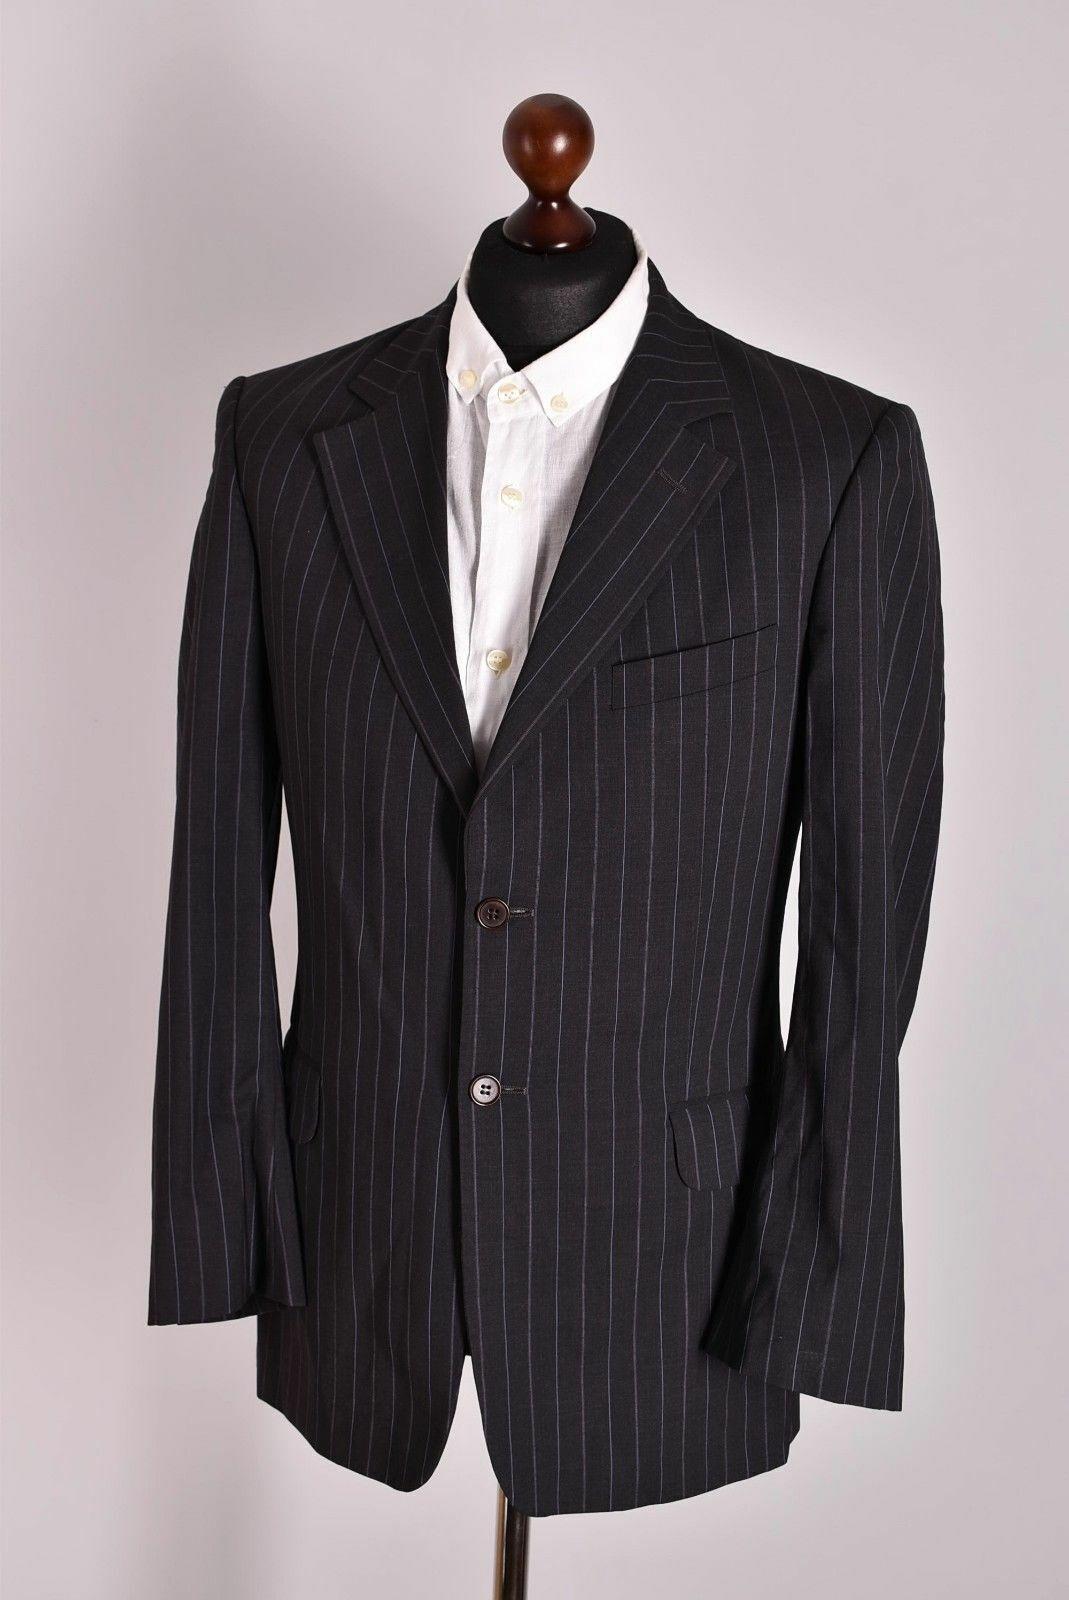 Paul Smith The Willoughby Wool Blazer Jacket Größe 38